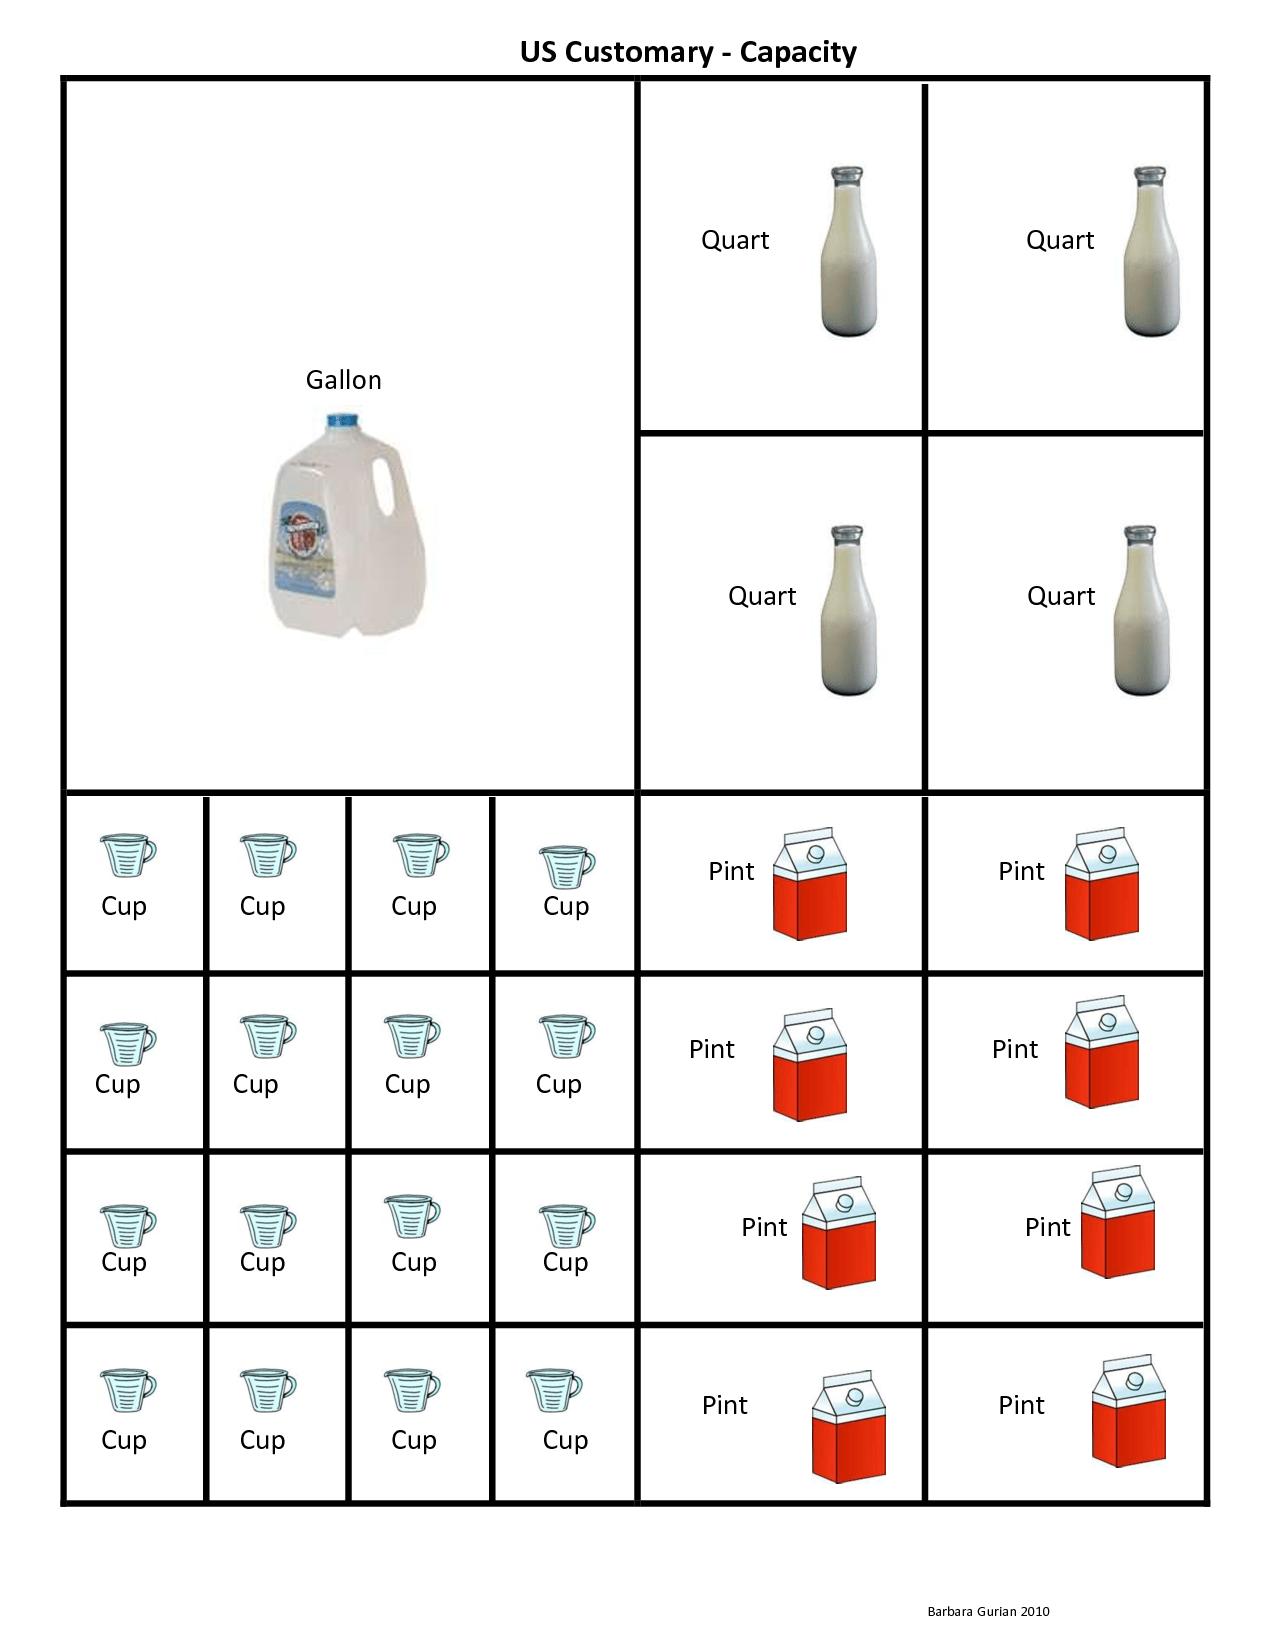 Cup Pint Quart Gallon Conversion Chart Clipart